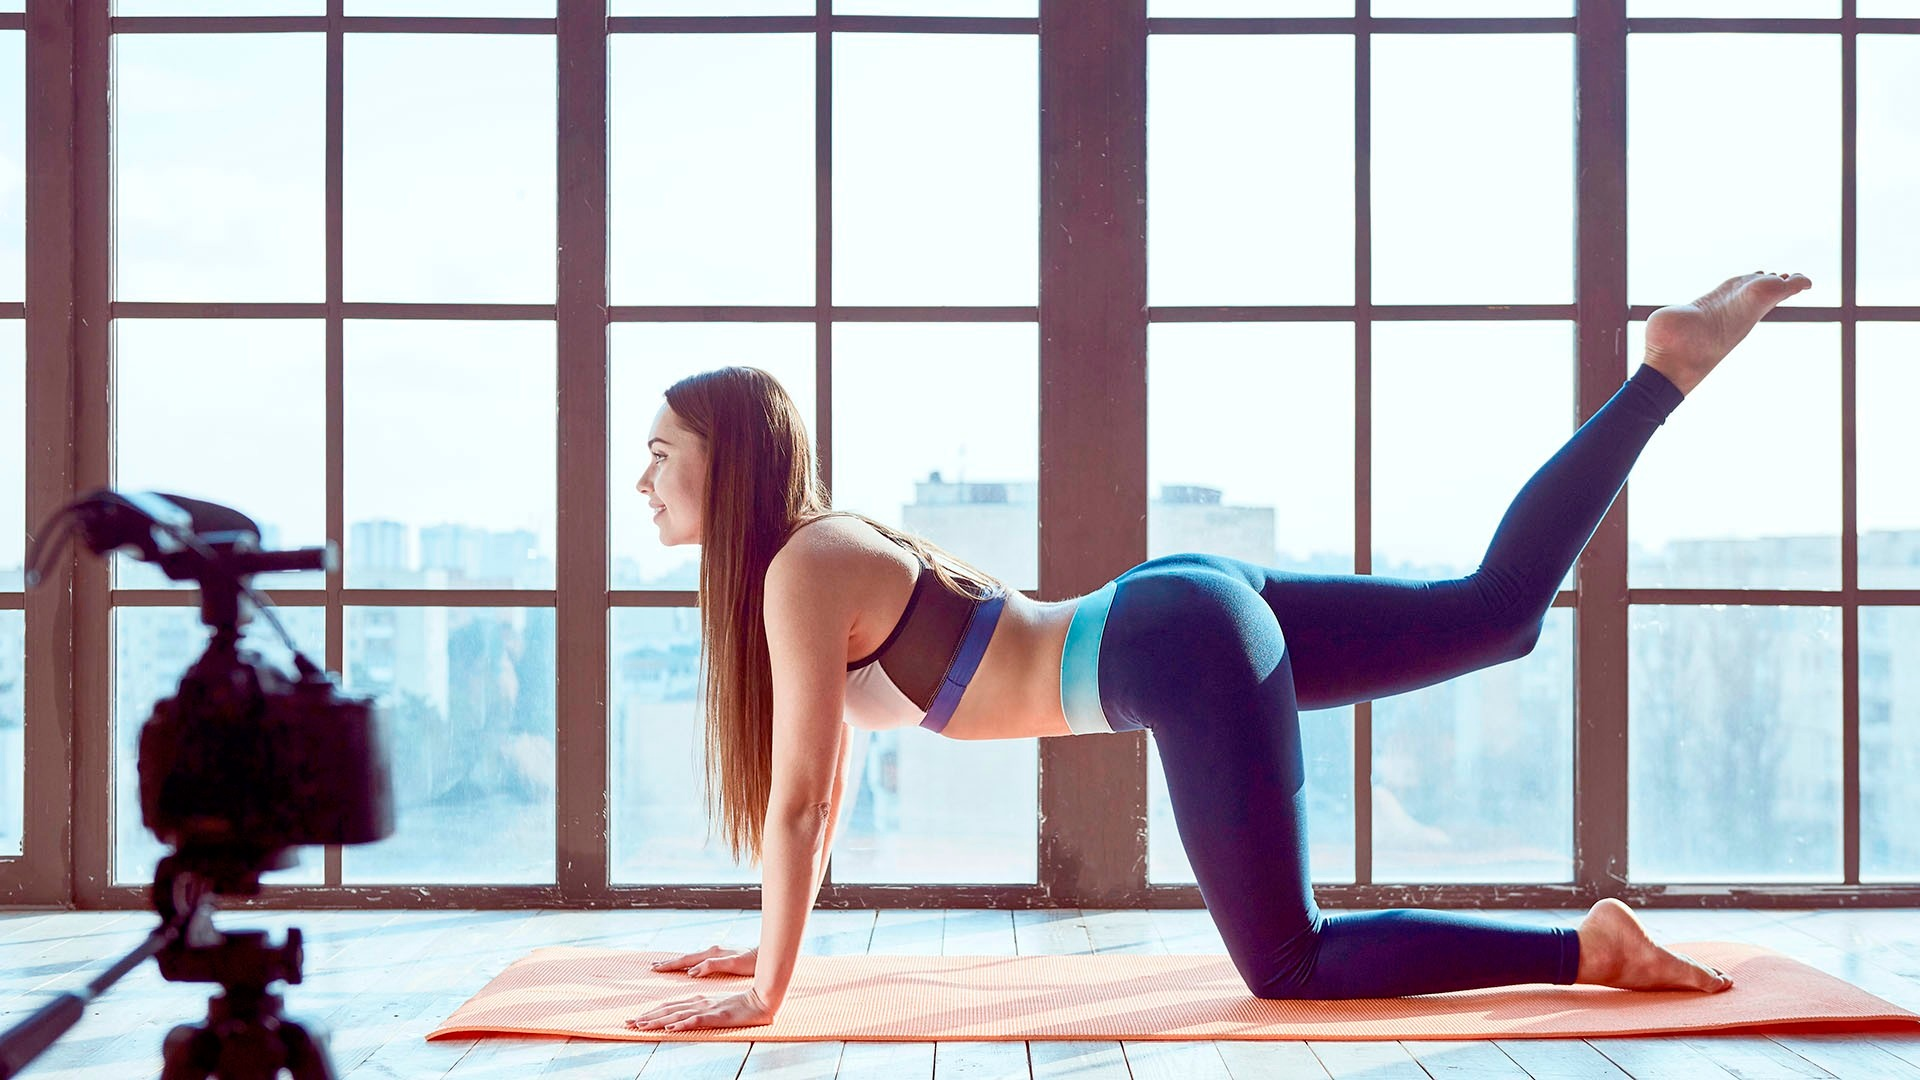 Upload Fitness Video - Fitness streaming platform